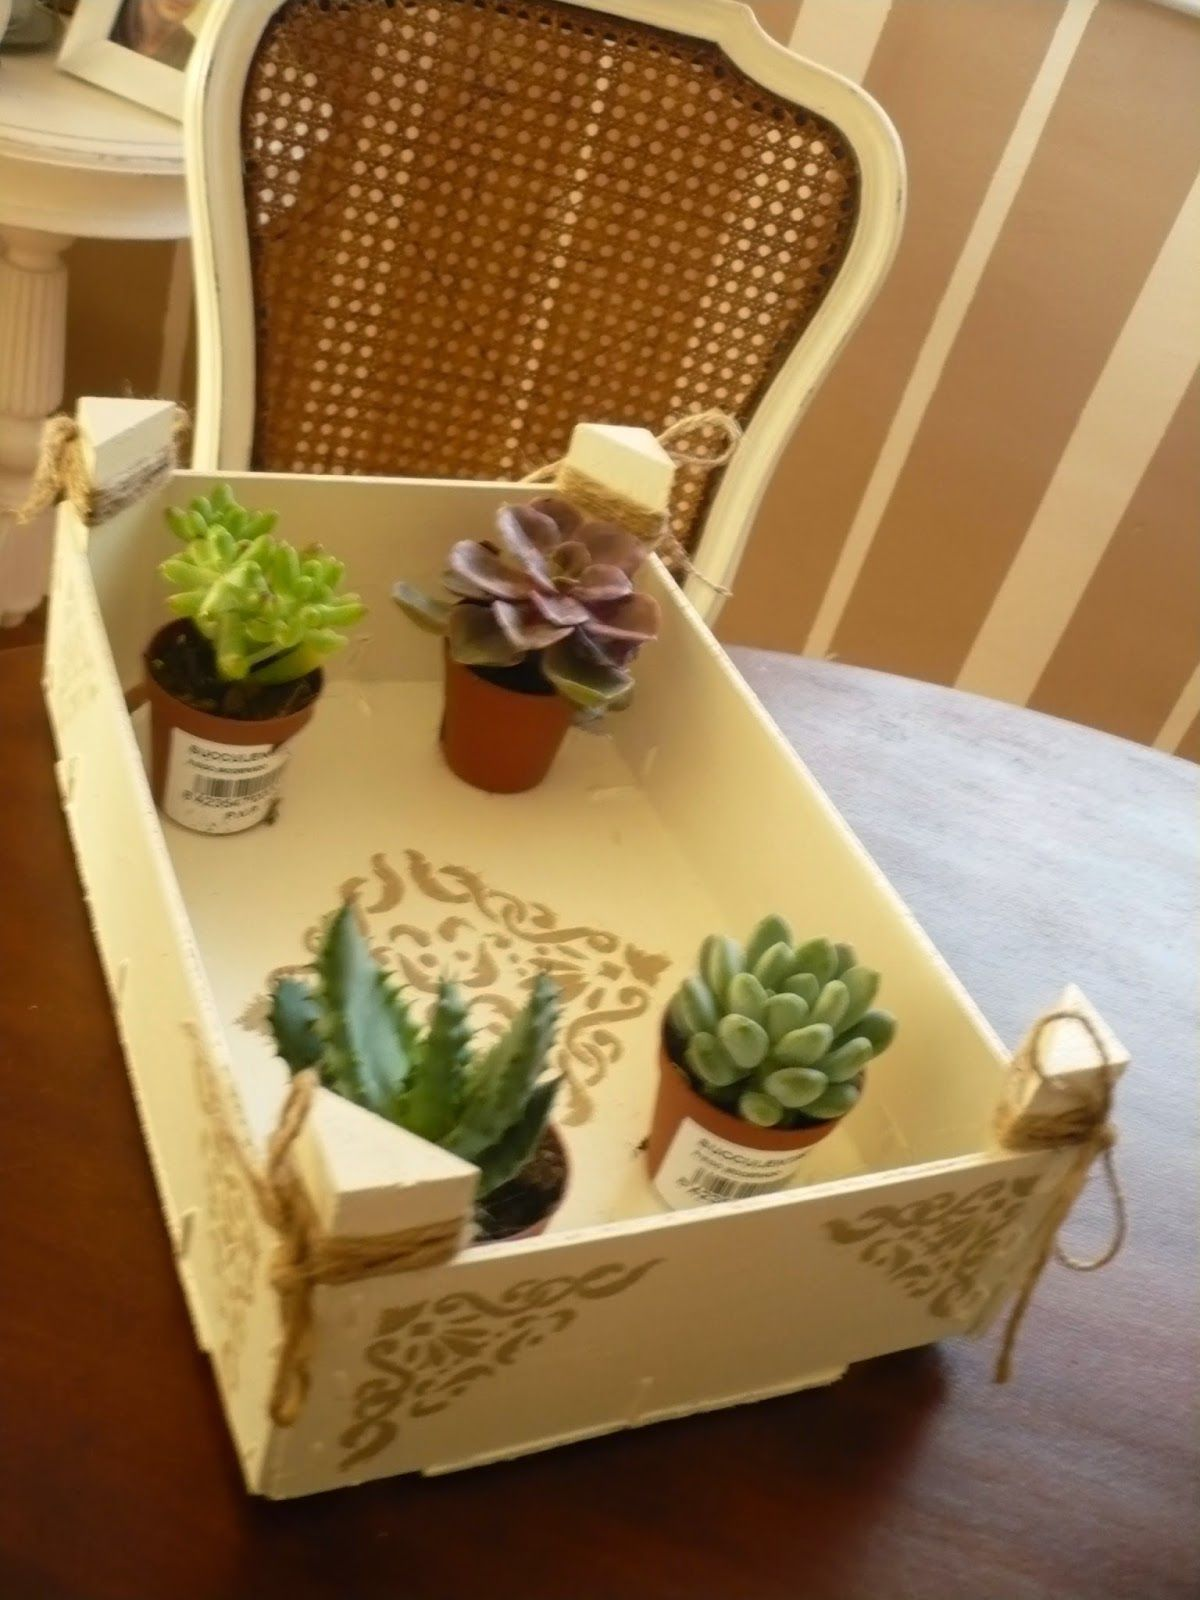 Cajas de fresas tuneadas cerca amb google caixes - Decorar cajas de madera manualidades ...